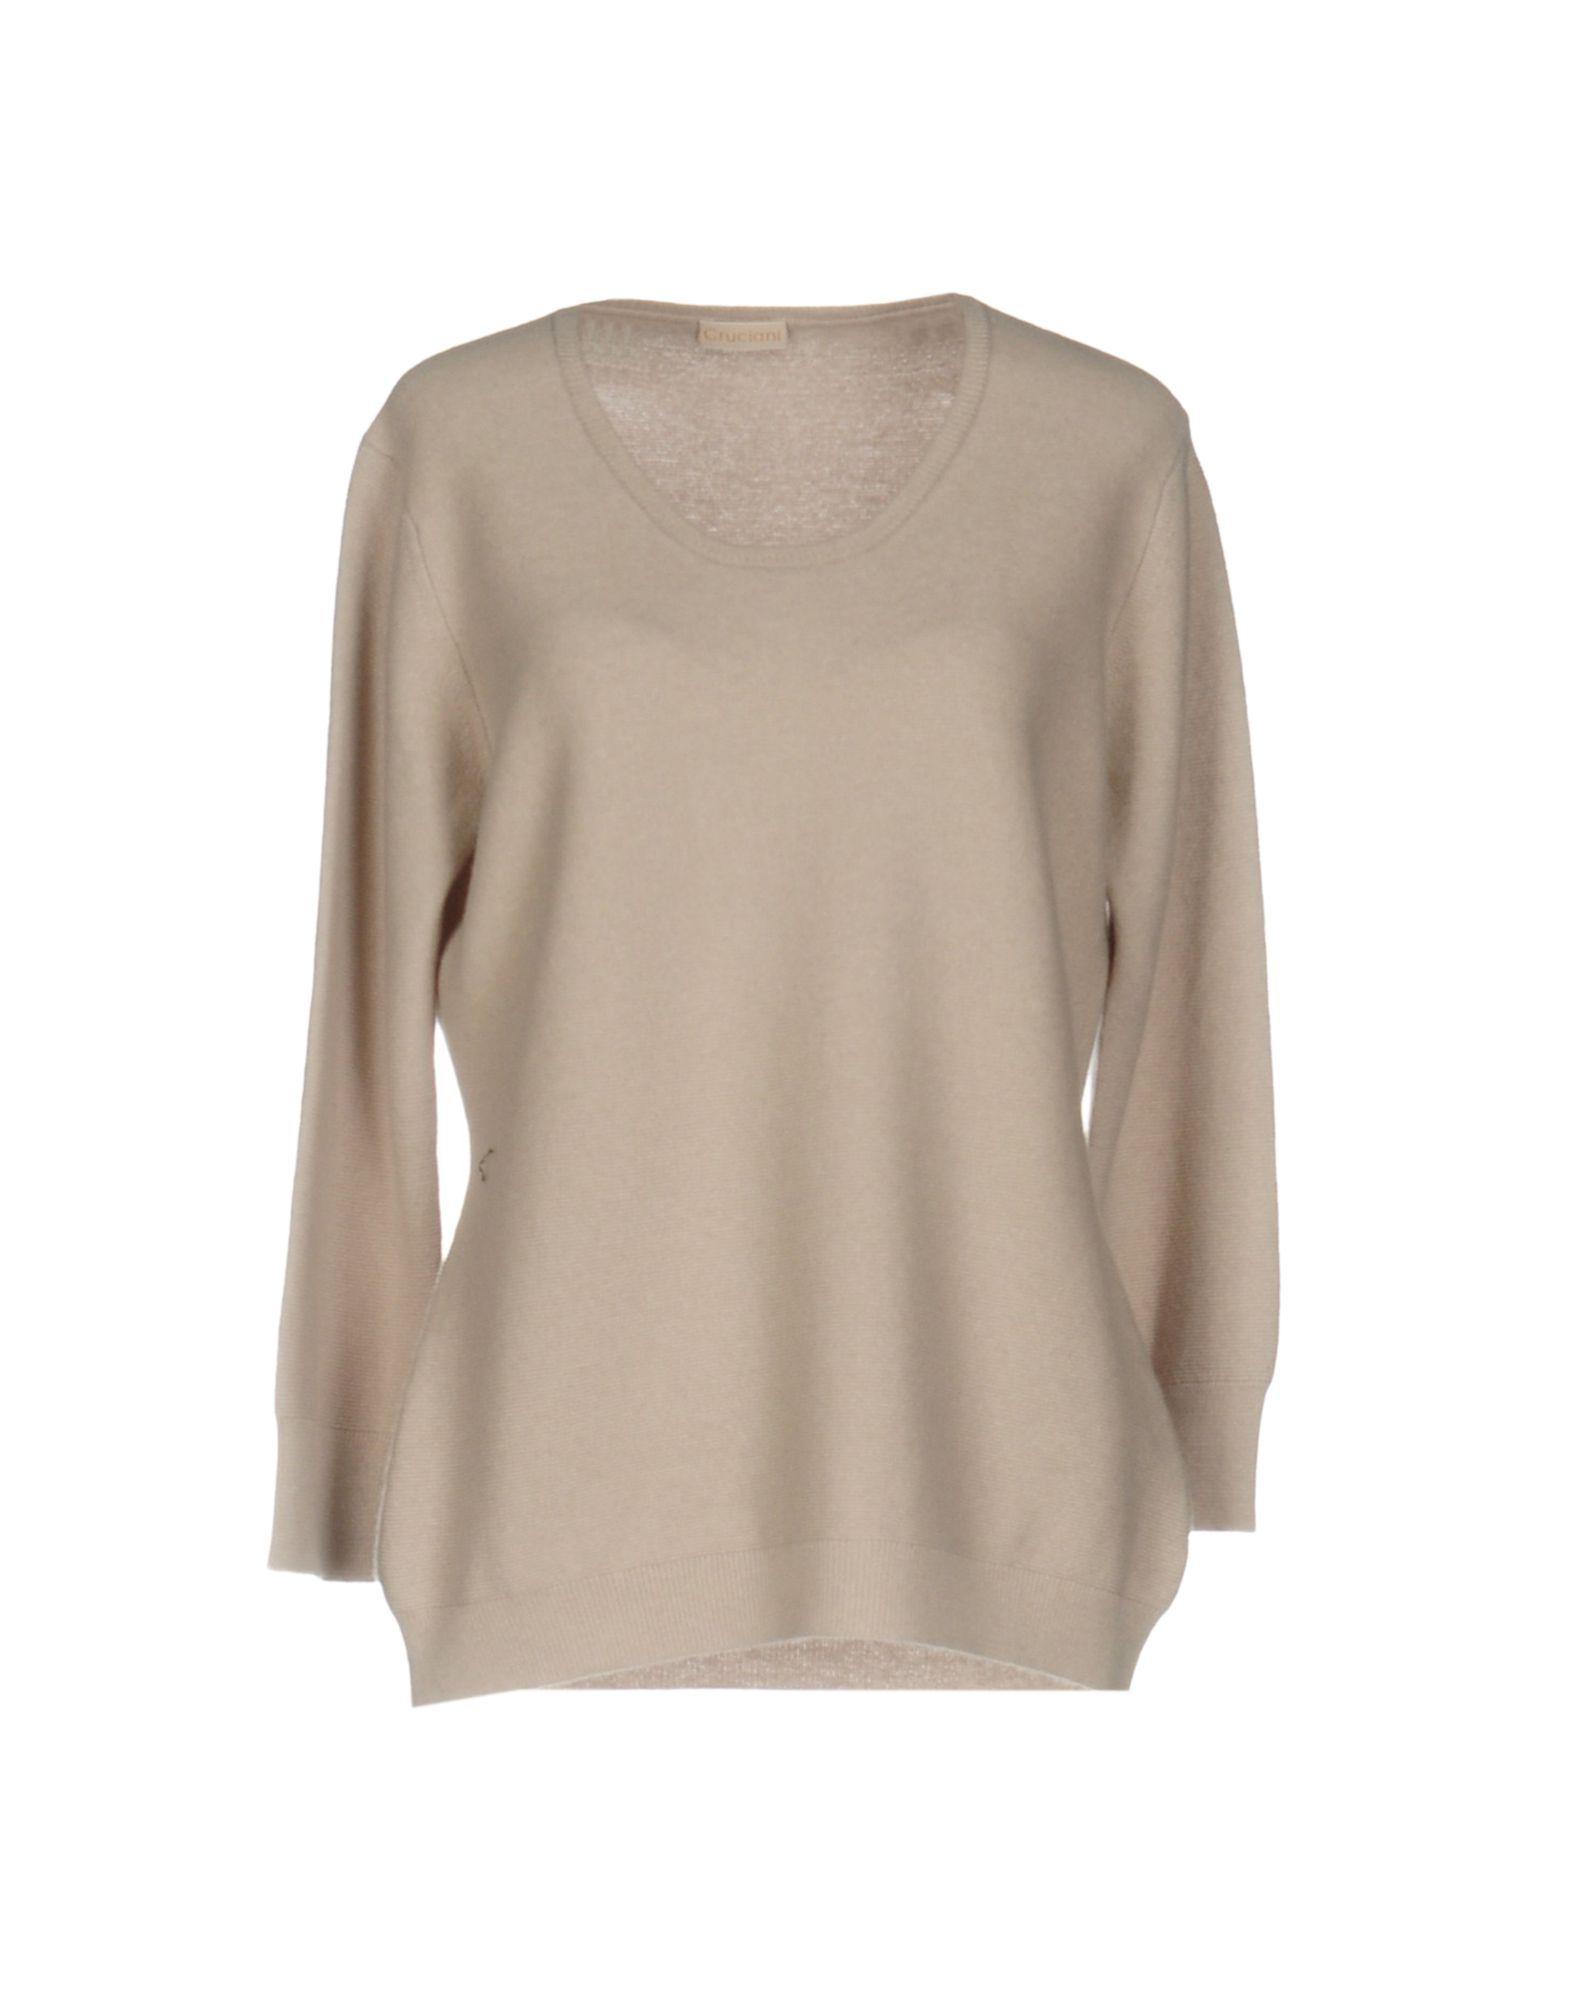 new style 2aeef d9b72 CRUCIANI SWEATERS. #cruciani #cloth # | Cruciani | Sweaters ...